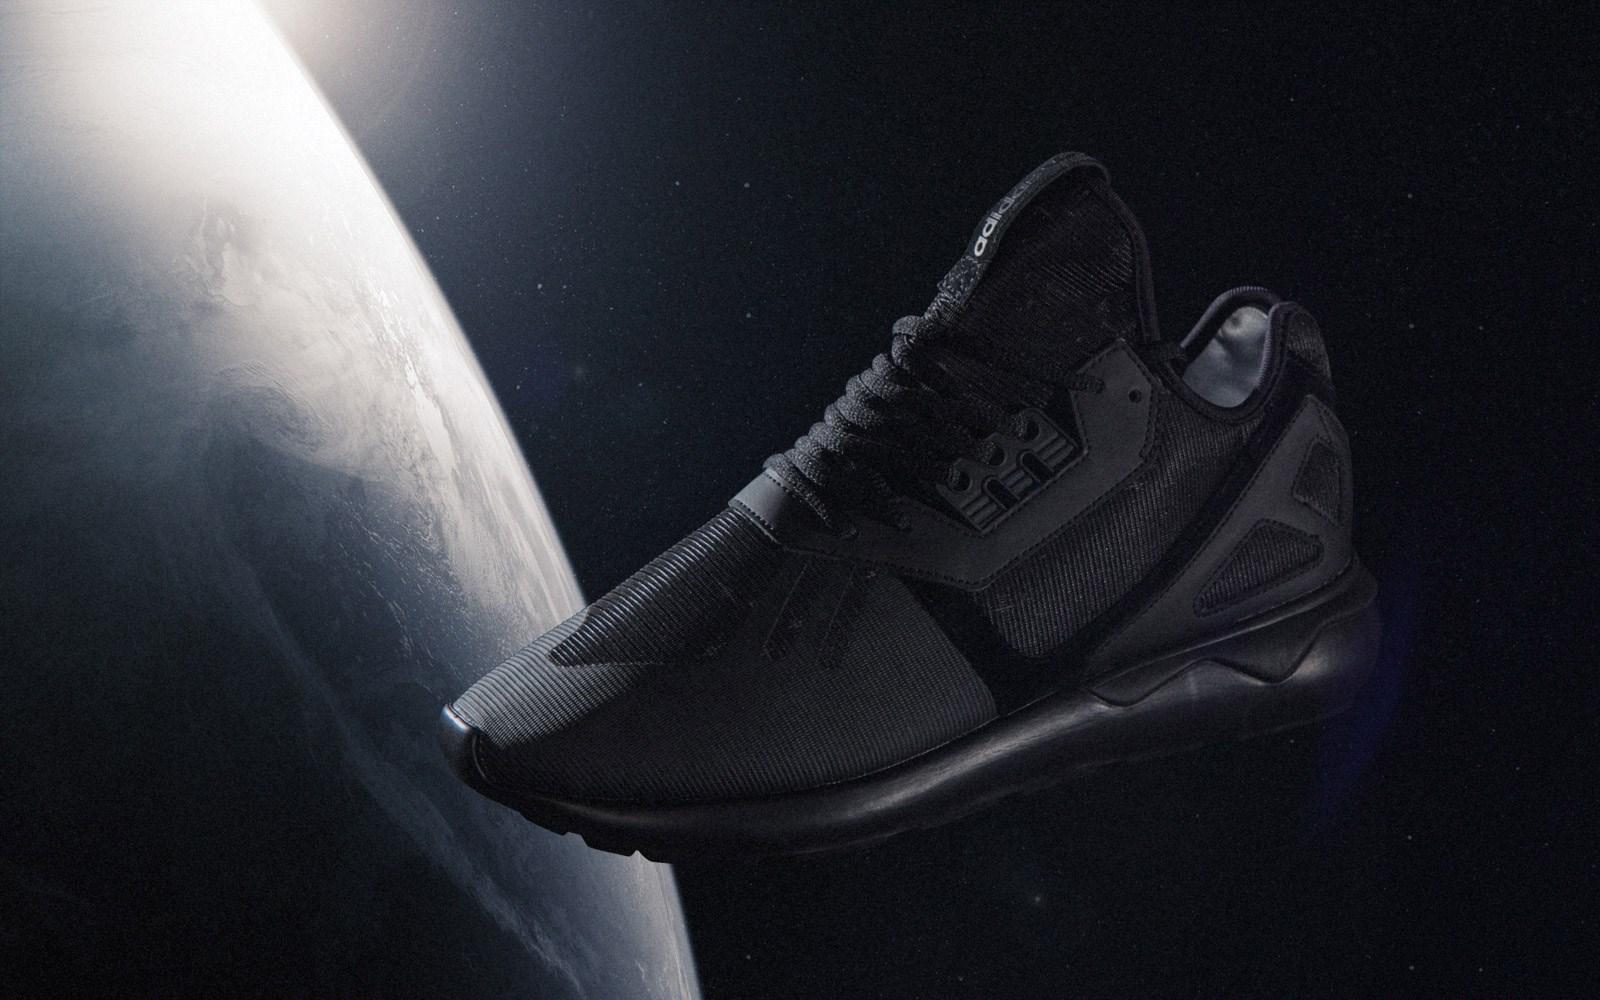 Adidas Tubular Runner Starry